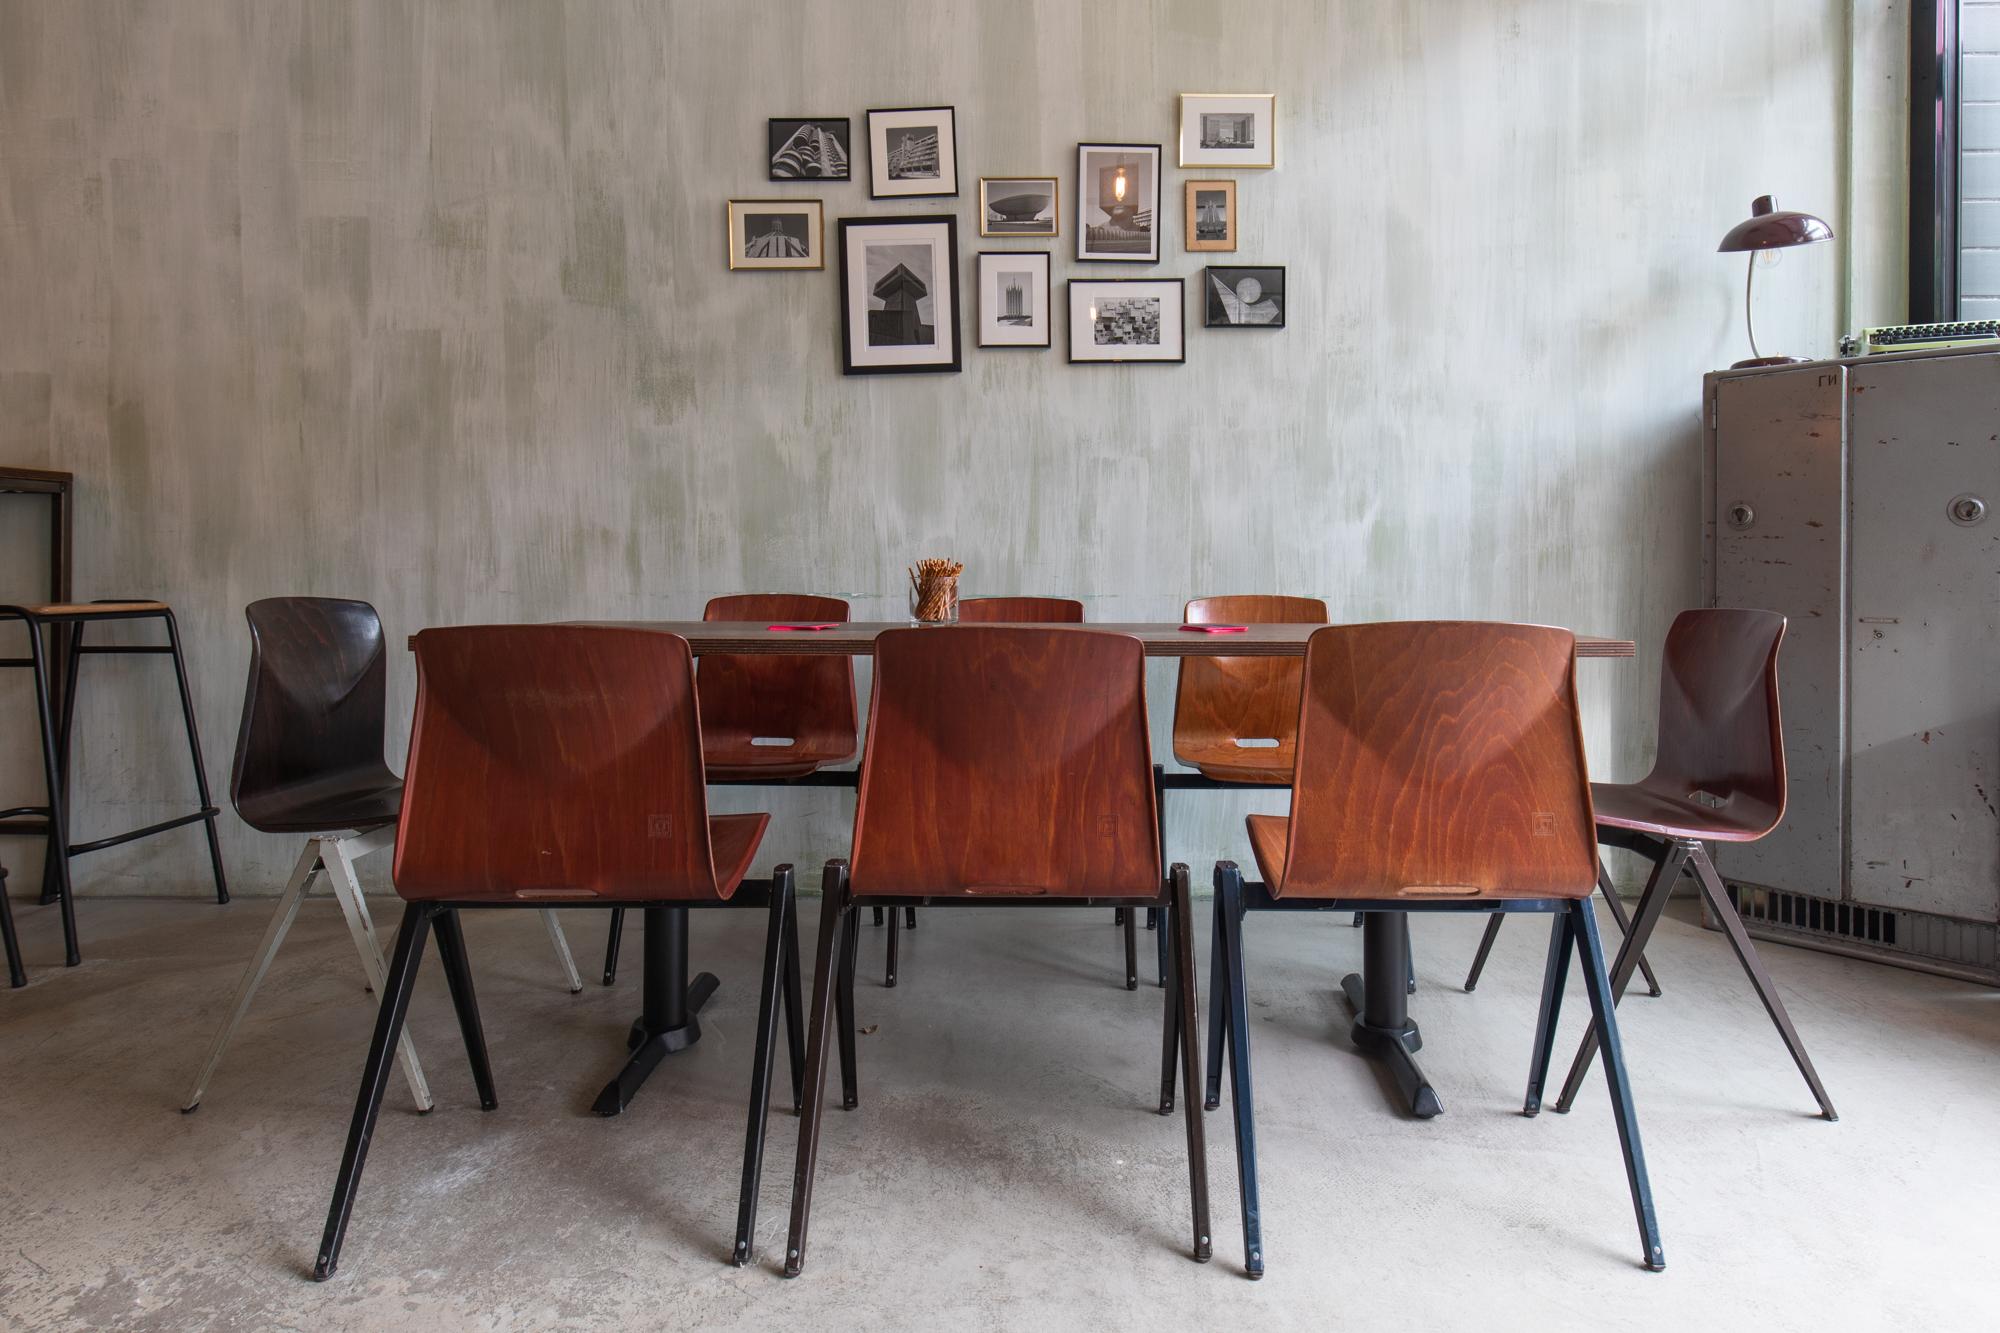 Furniture at Muted Horn, a craft beer bar in Berlin Neukölln